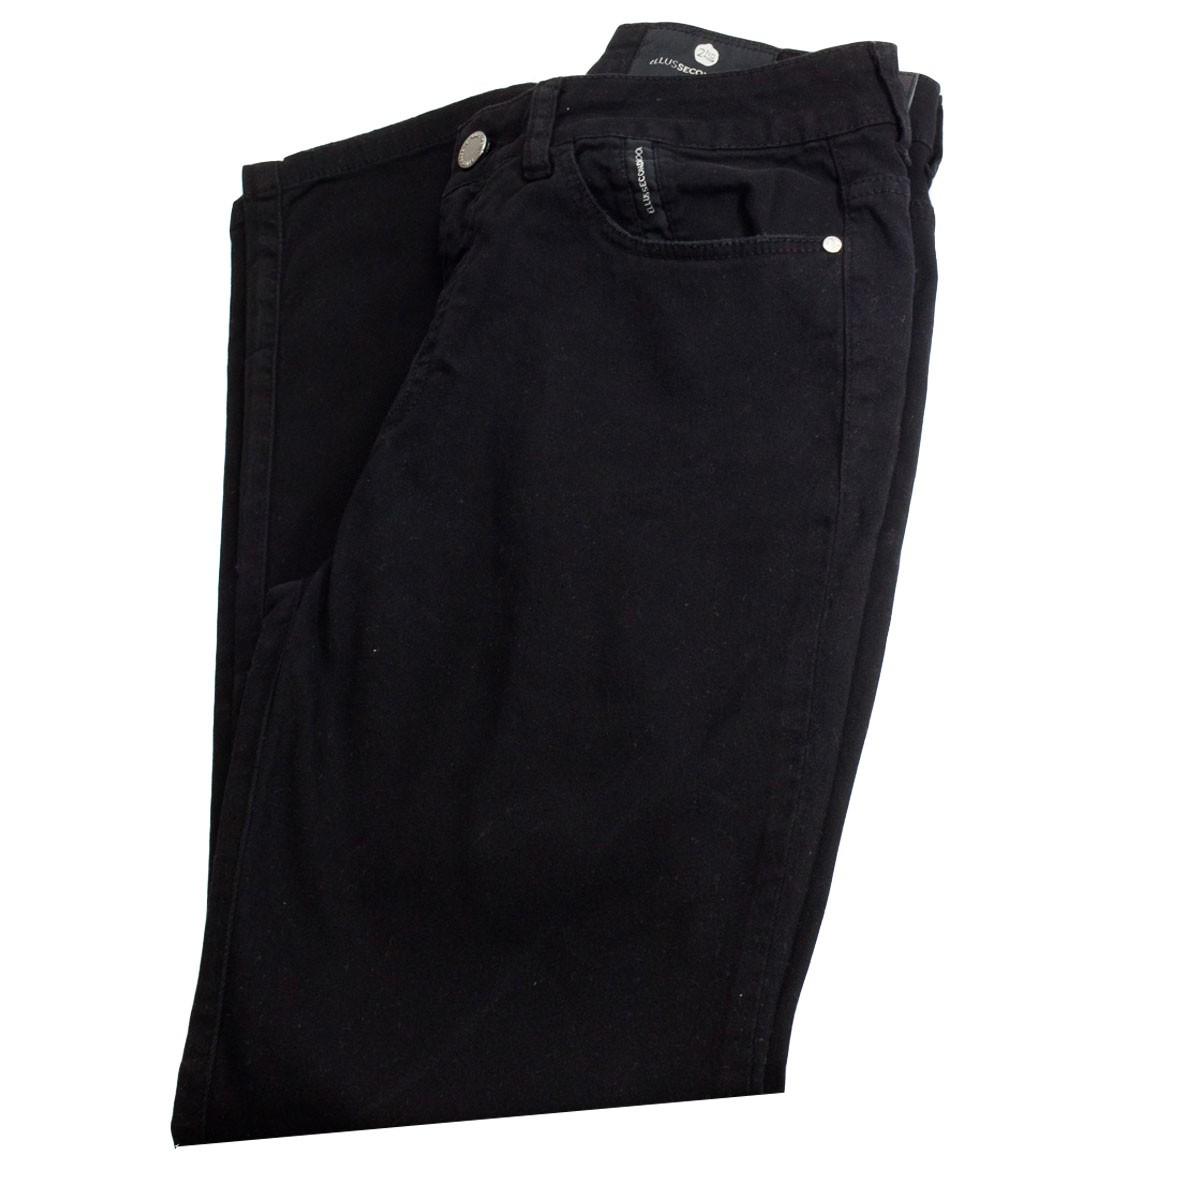 Calça Jeans Ellus Second Floor Soft Color Gisele 20sa437 Preto